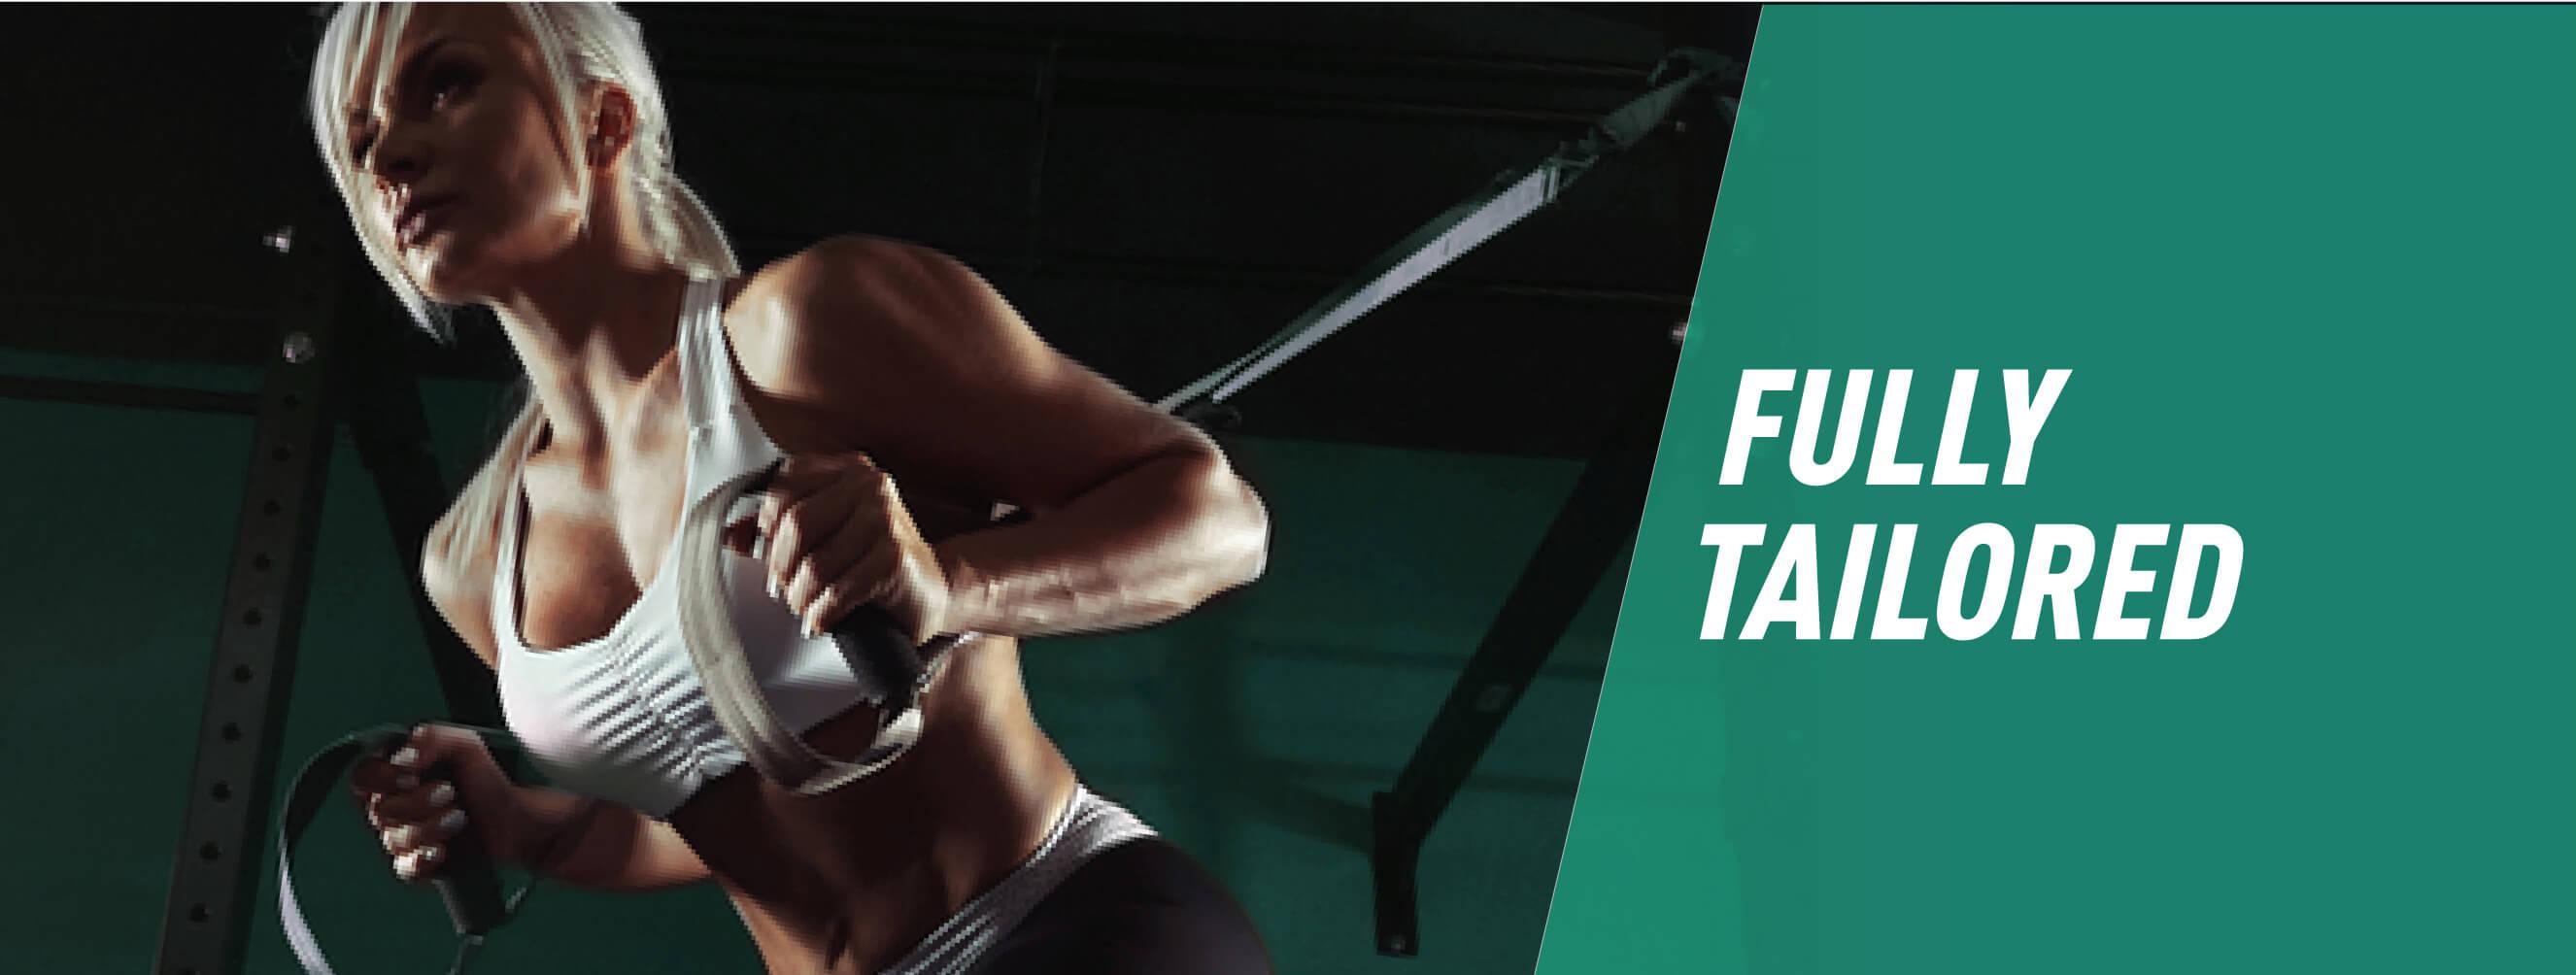 Fully Tailored Online Training Programme - Female Banner